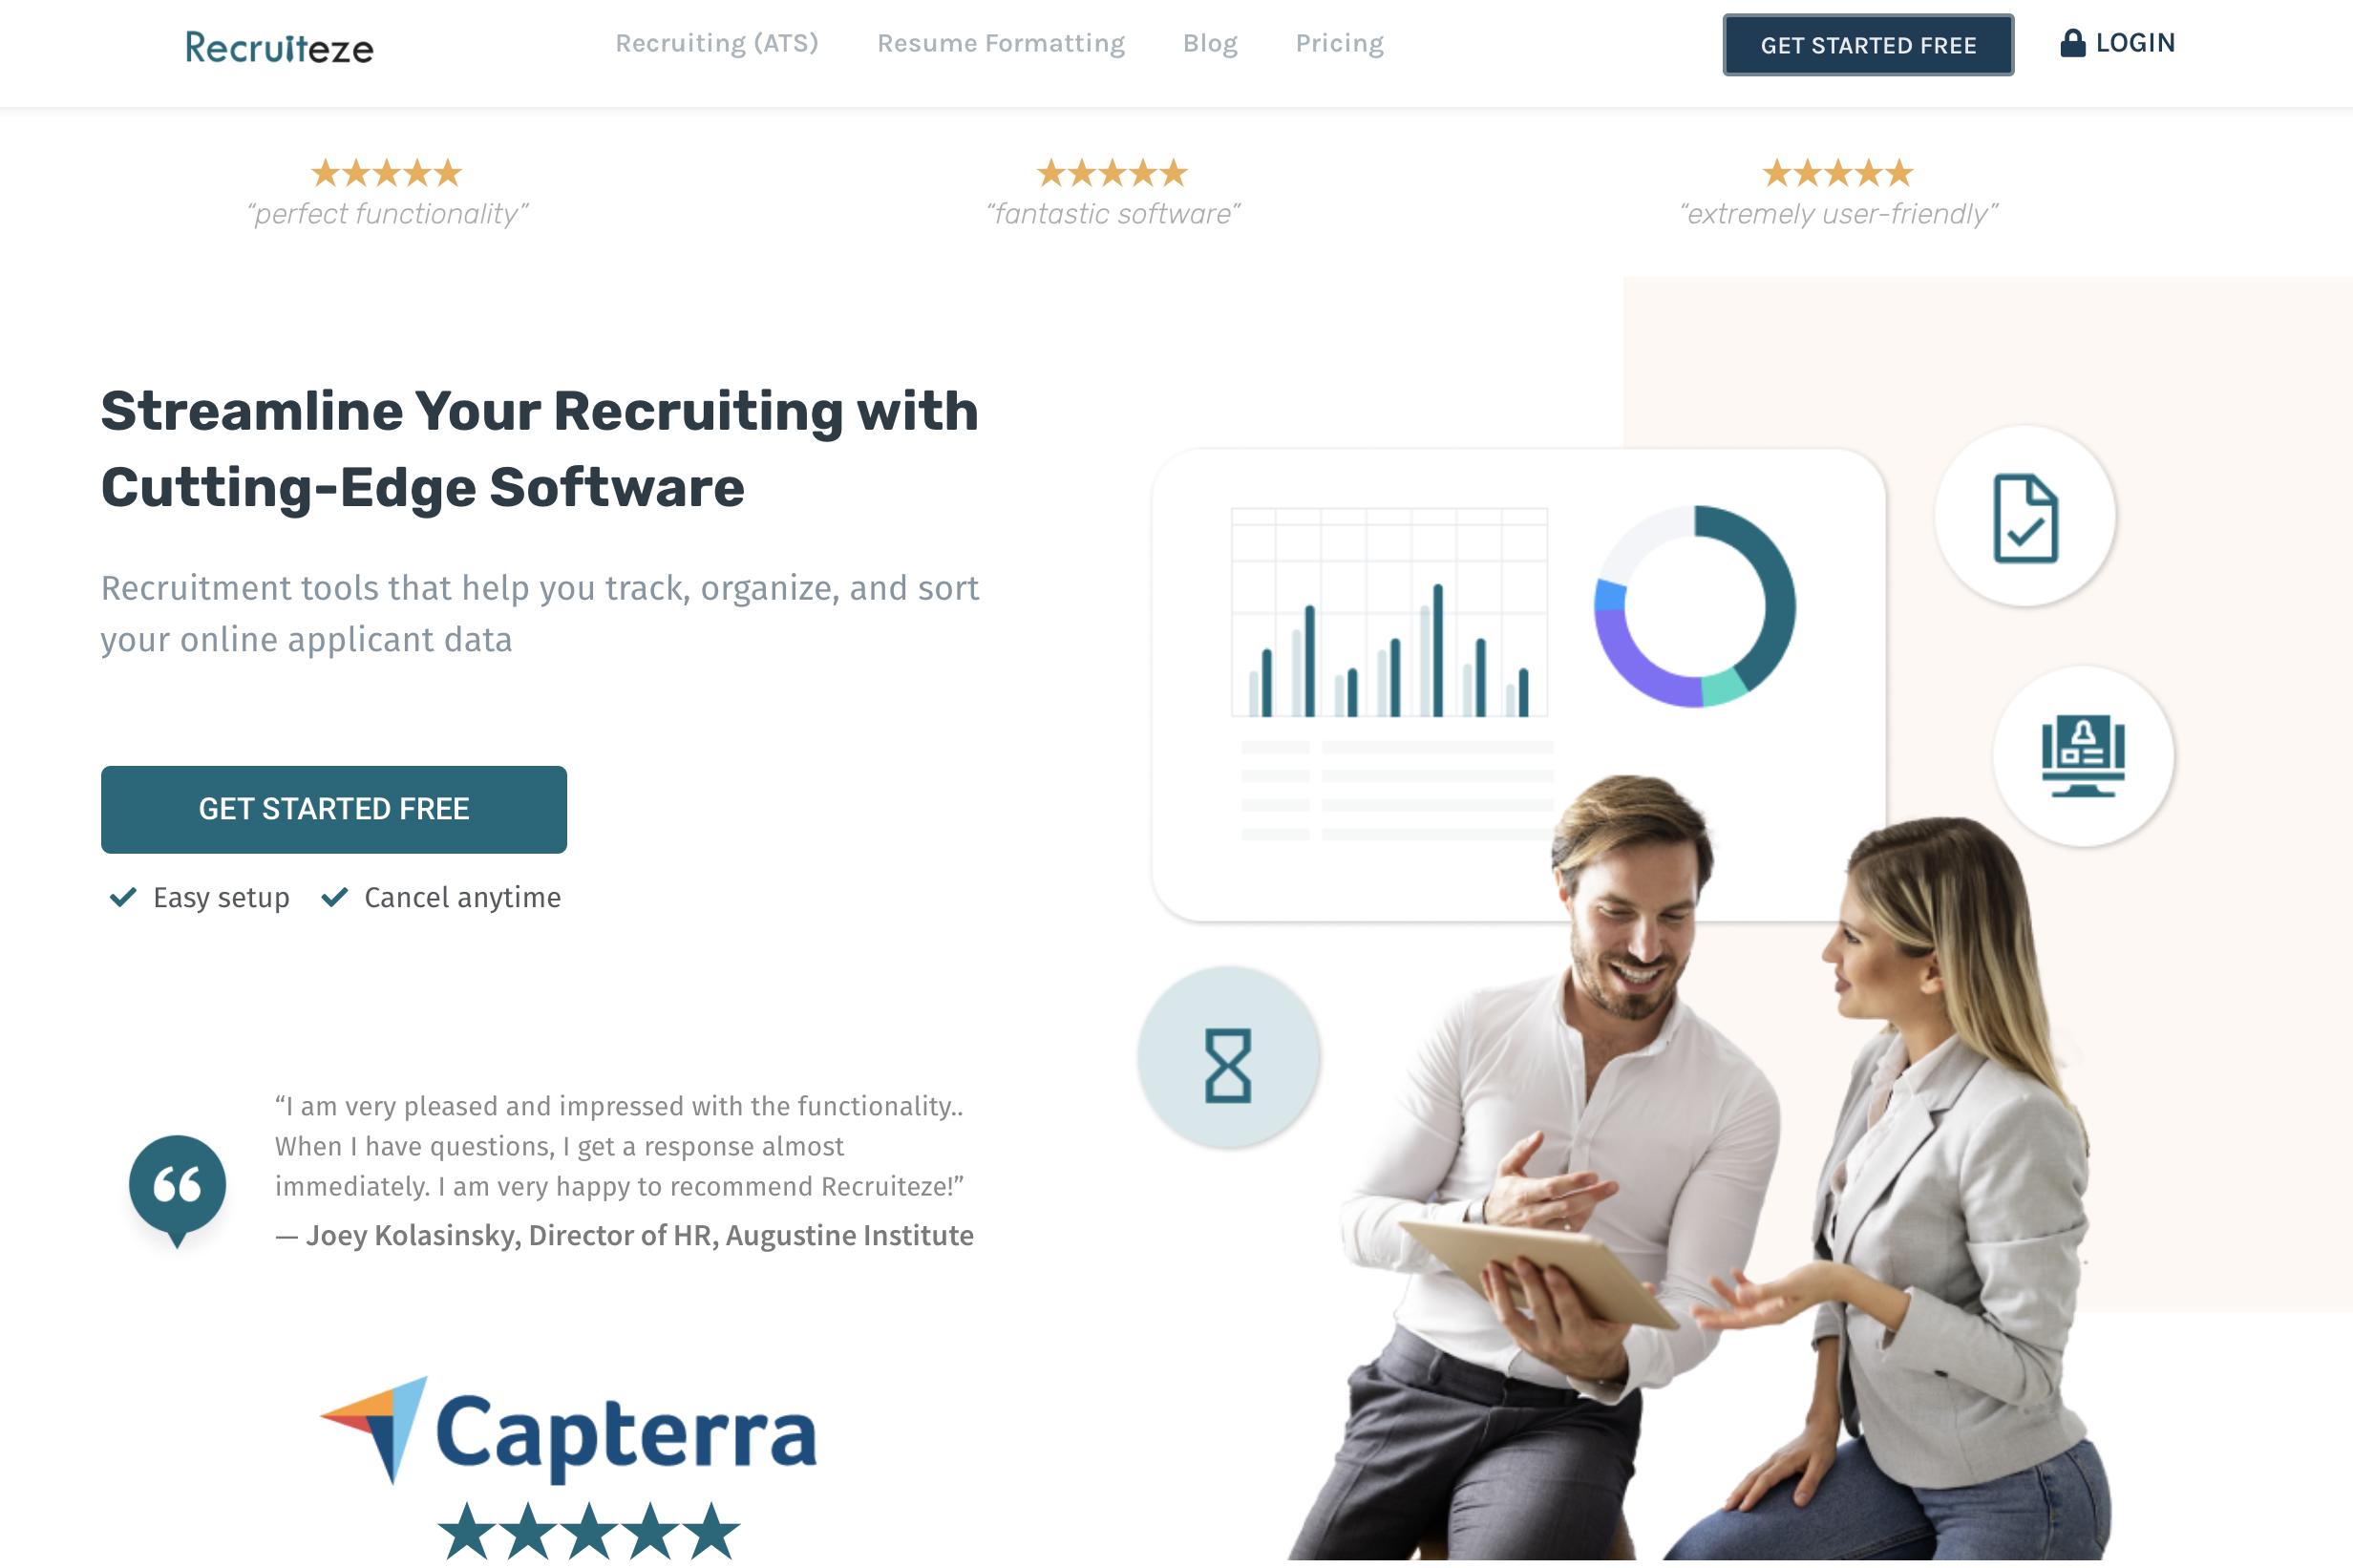 Recruiteze homepage